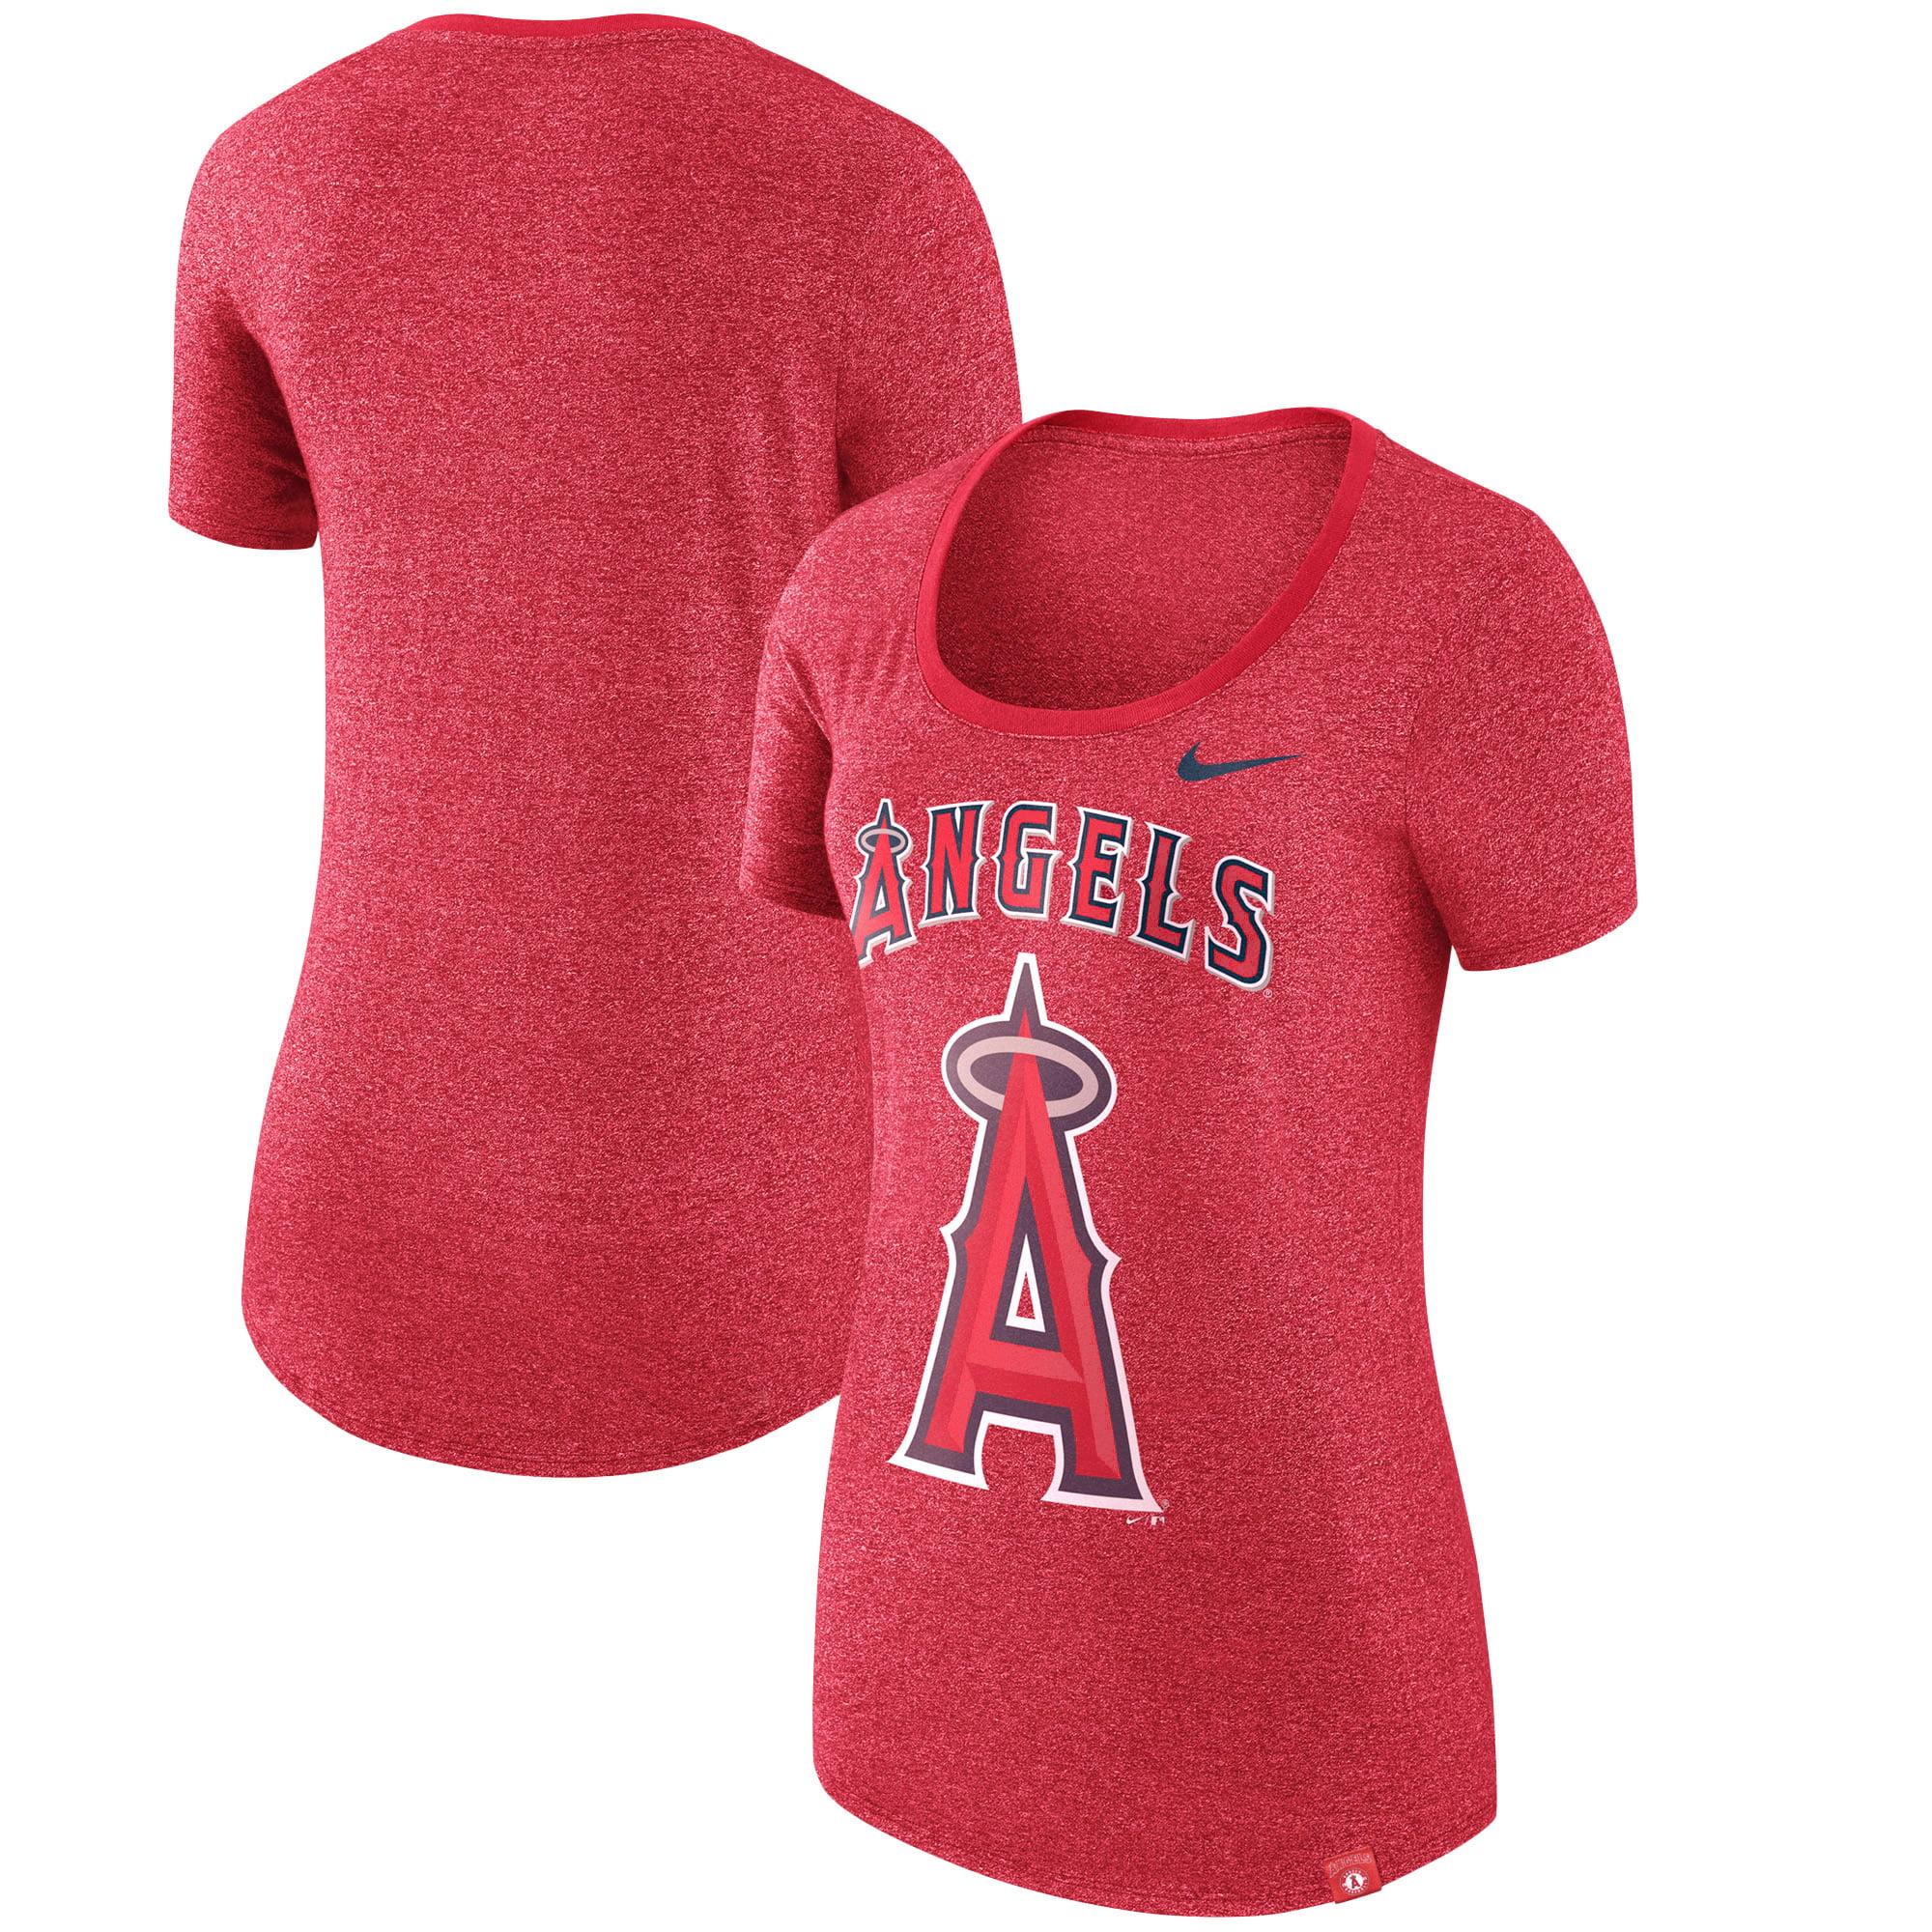 Los Angeles Angels Nike Women's Marled Boyfriend 1.7 T-Shirt - Heathered Red